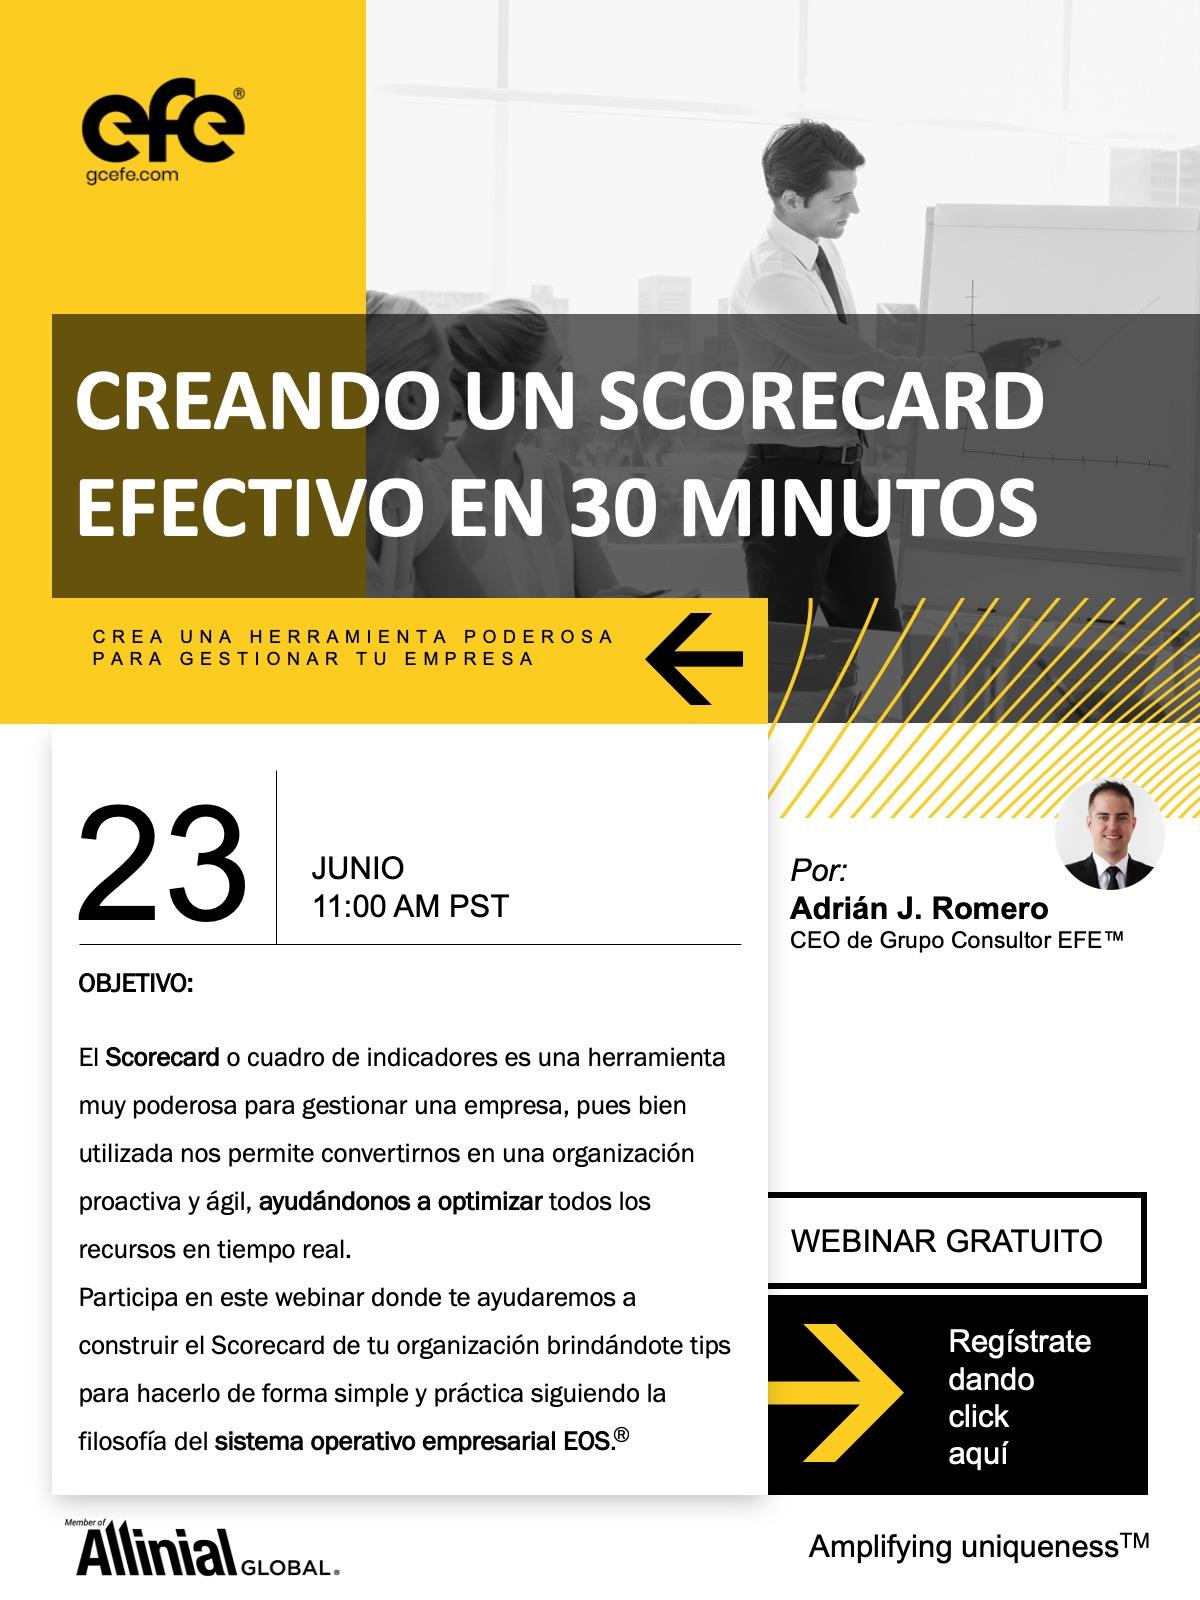 Creando Un Scorecard Efectivo En 30 Minutos